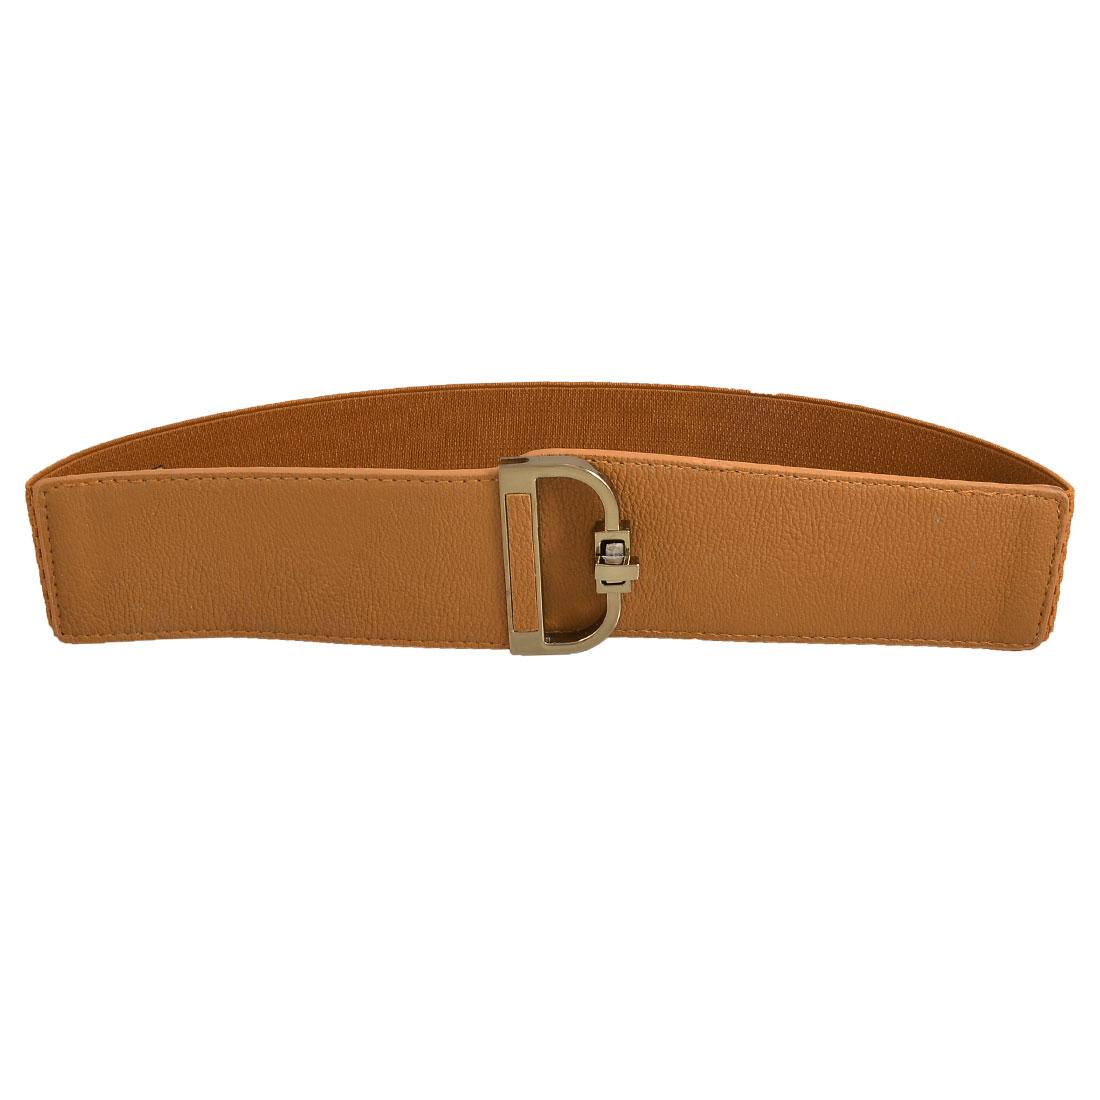 Gold Tone Metal D Shape Turn Lock Closure Elastic Cinch Belt Brown